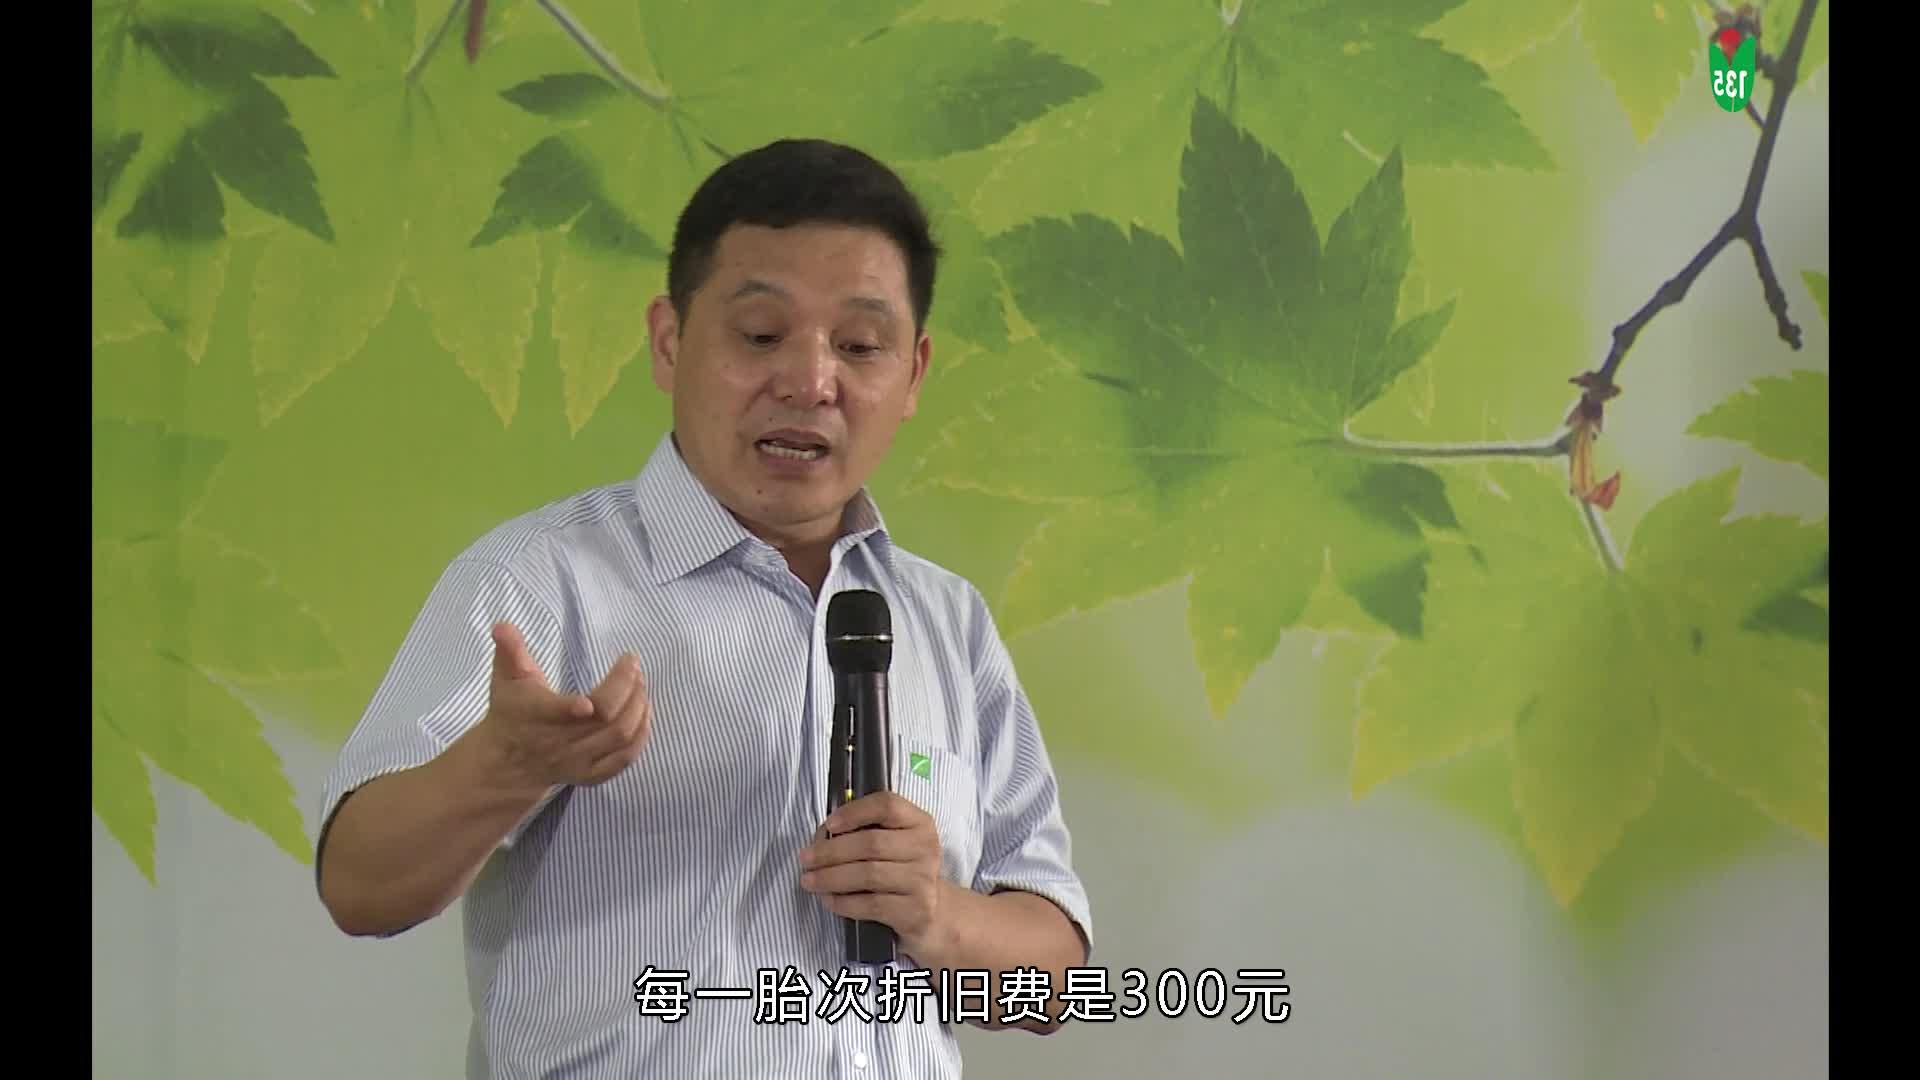 ��l:135高效保健�B�i技�g之母�i保健技�g(文利新教授)